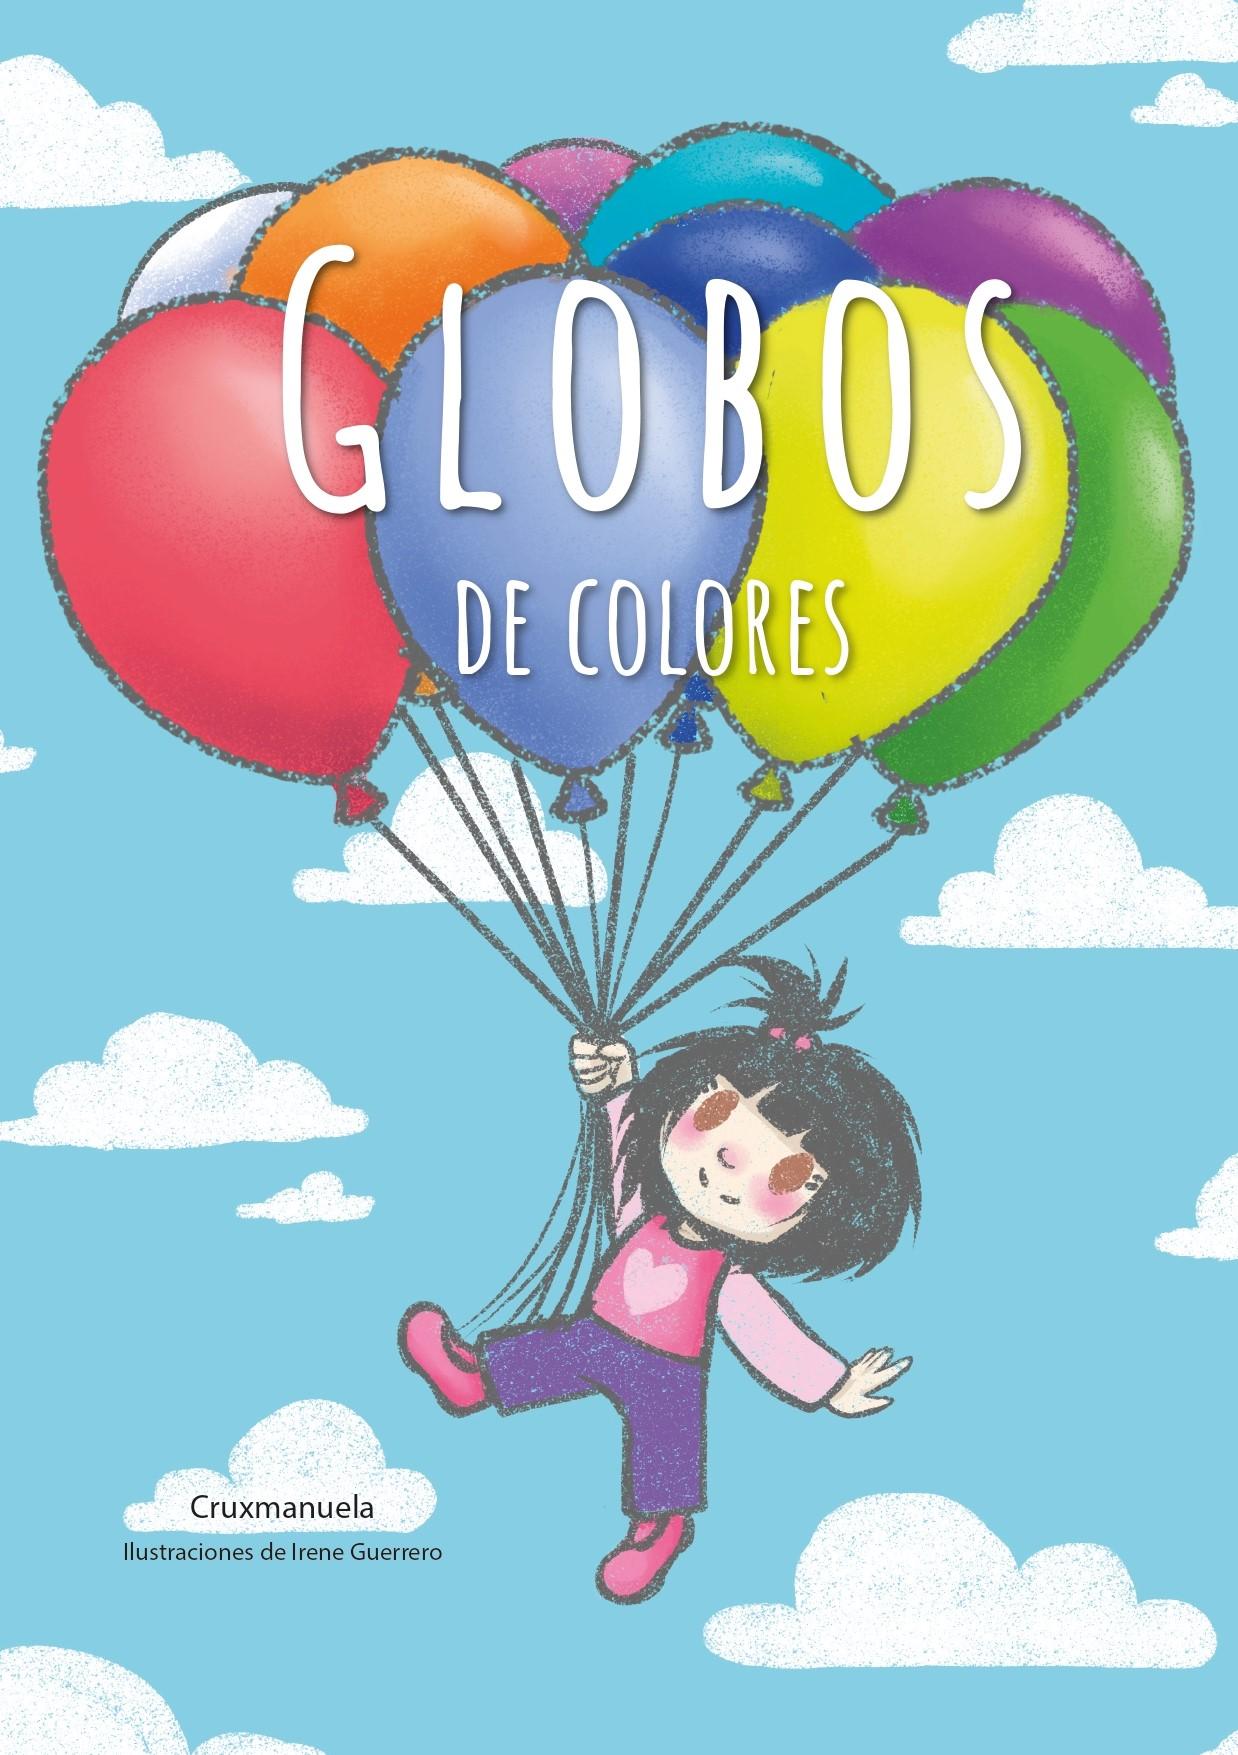 CUBIERTA Globos_page-0001